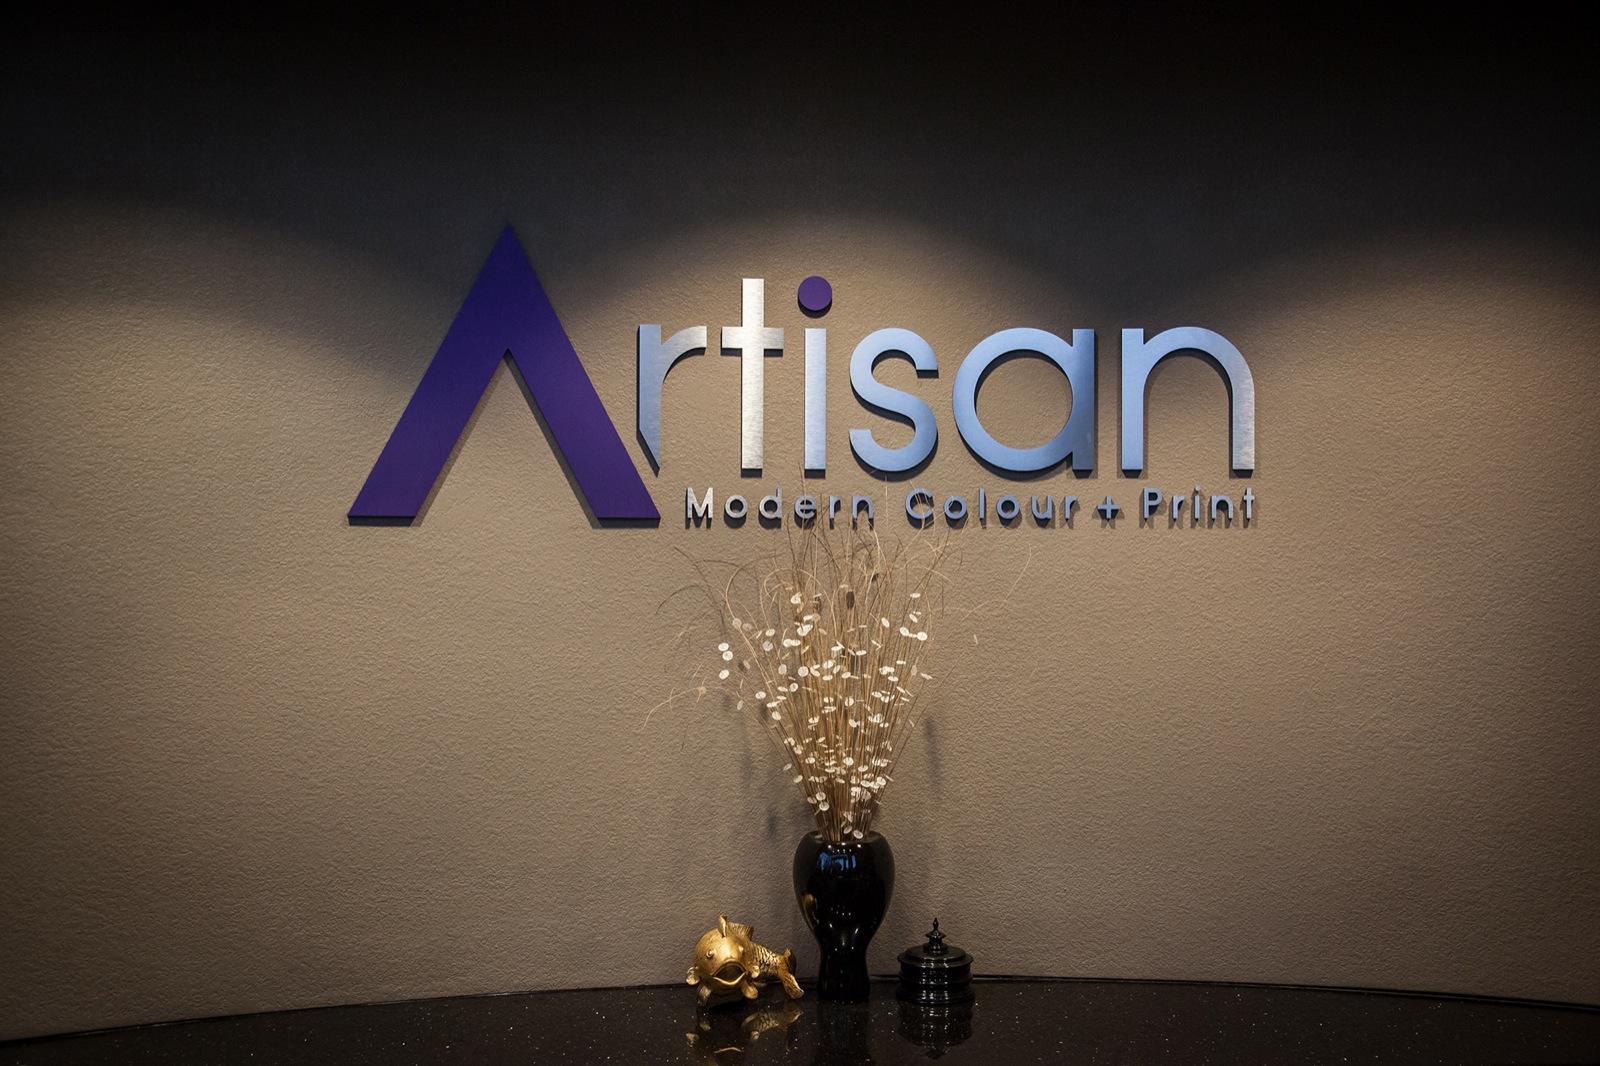 rebranded Artisan lobby